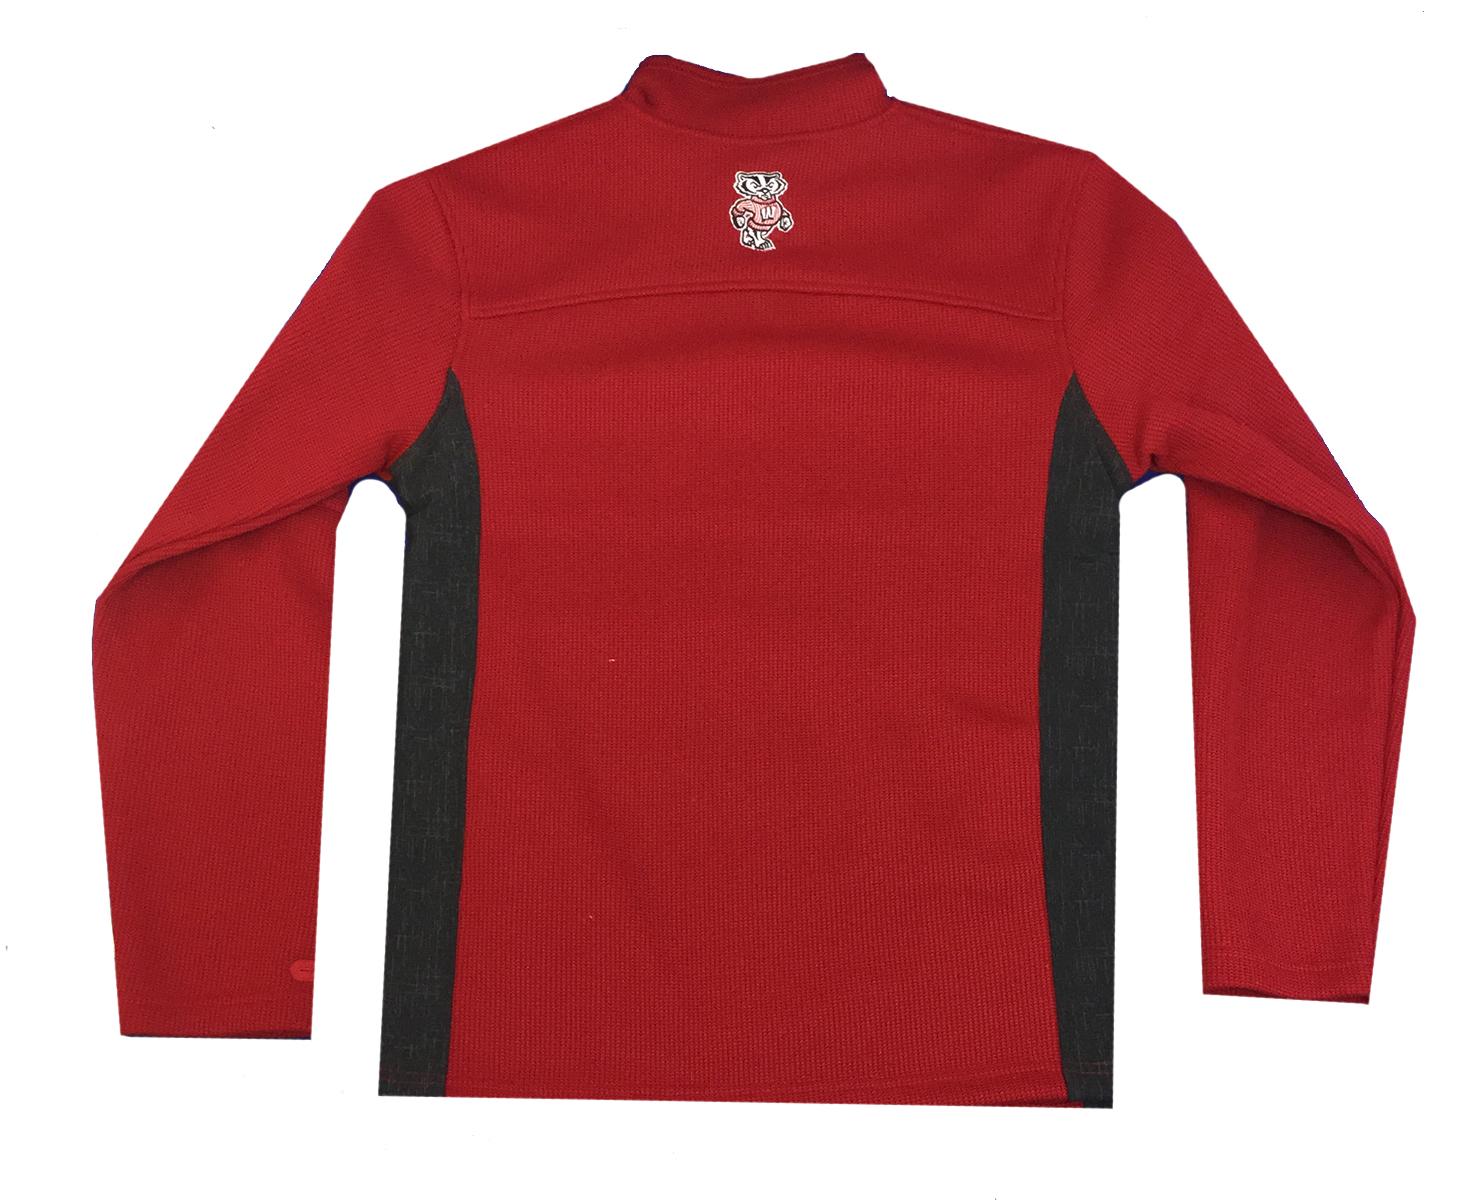 e49a8c28579d Colosseum Wisconsin Badgers Mens Advantage Quarter Zip Pullover - Trenz  Shirt Company